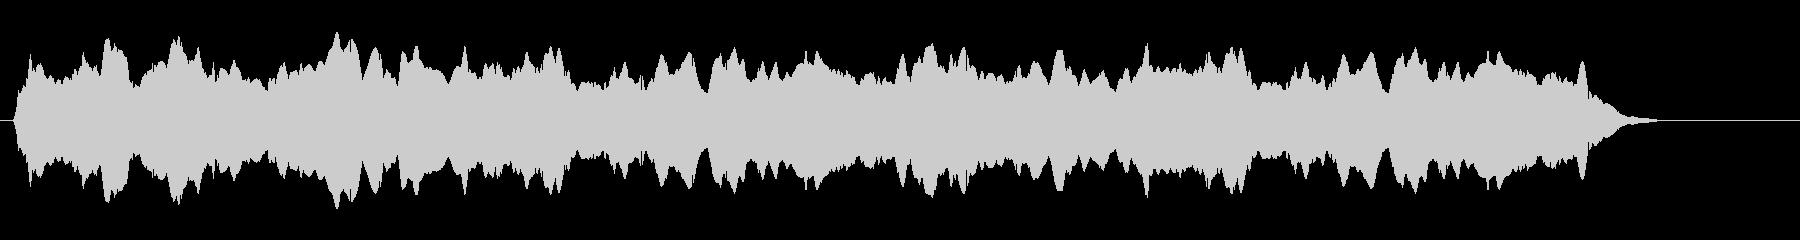 Gのストリングシンセドローン、音楽...の未再生の波形